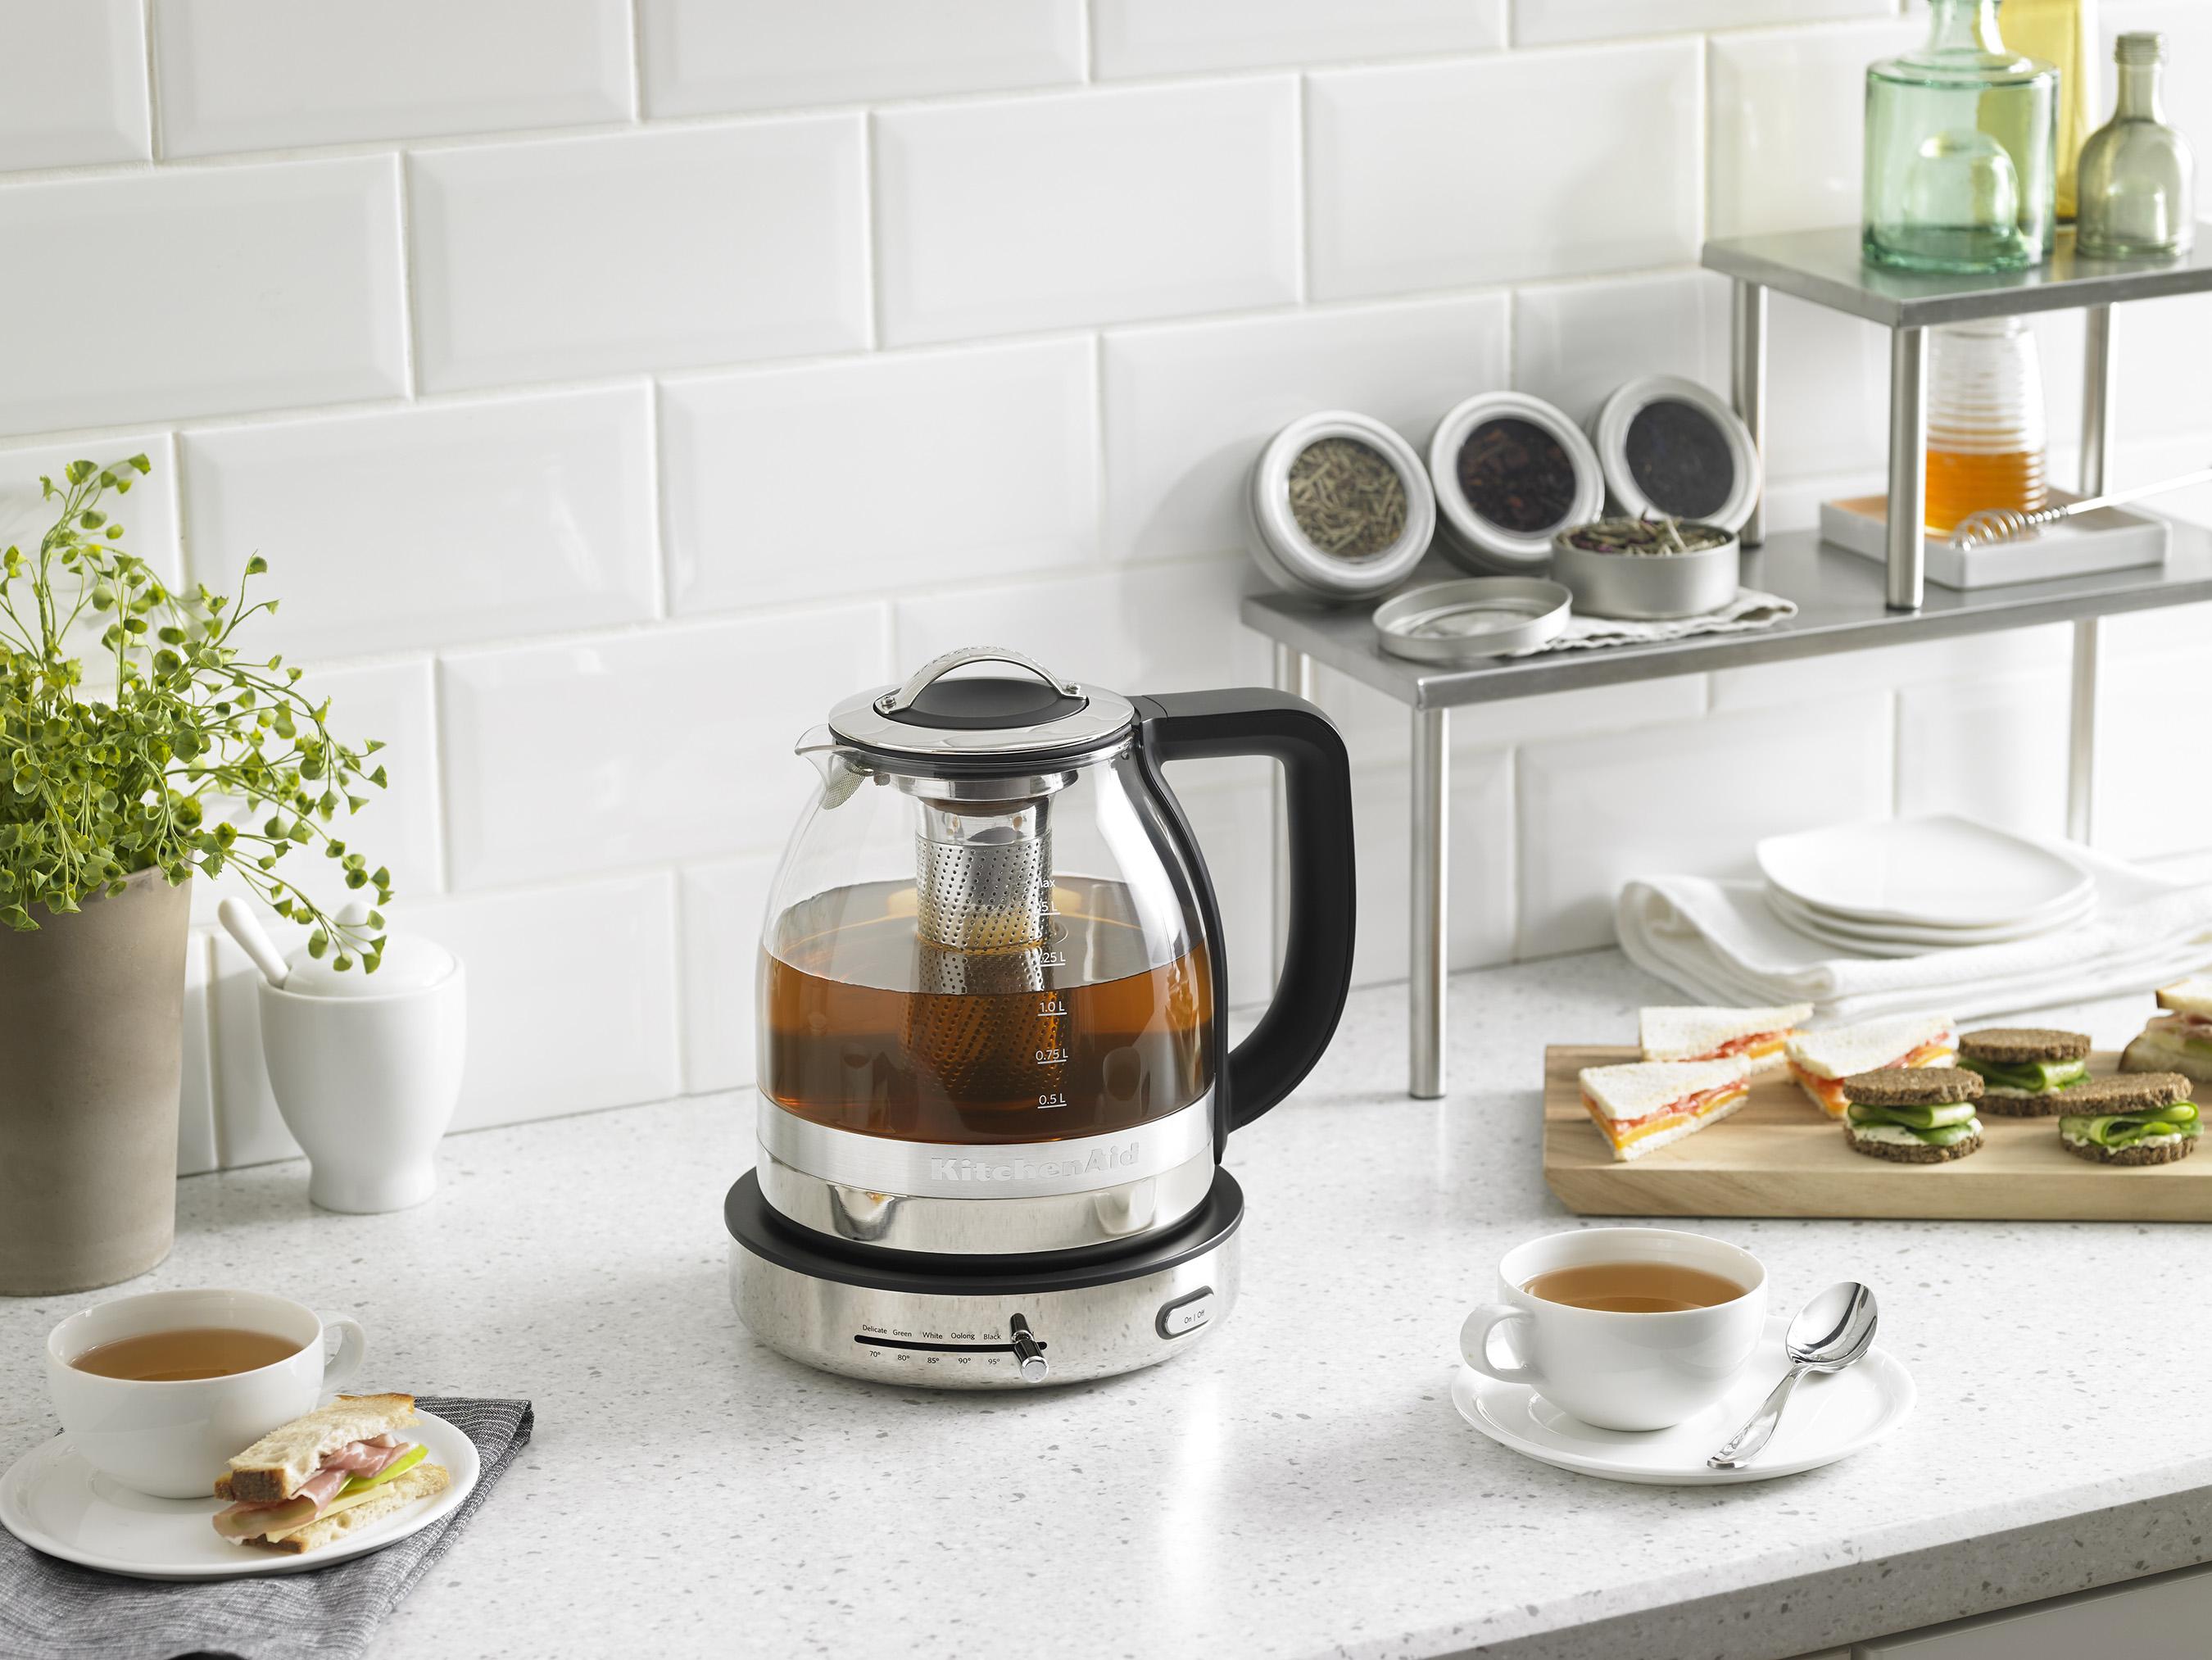 kitchenaid-glass-tea-kettle-15-hr